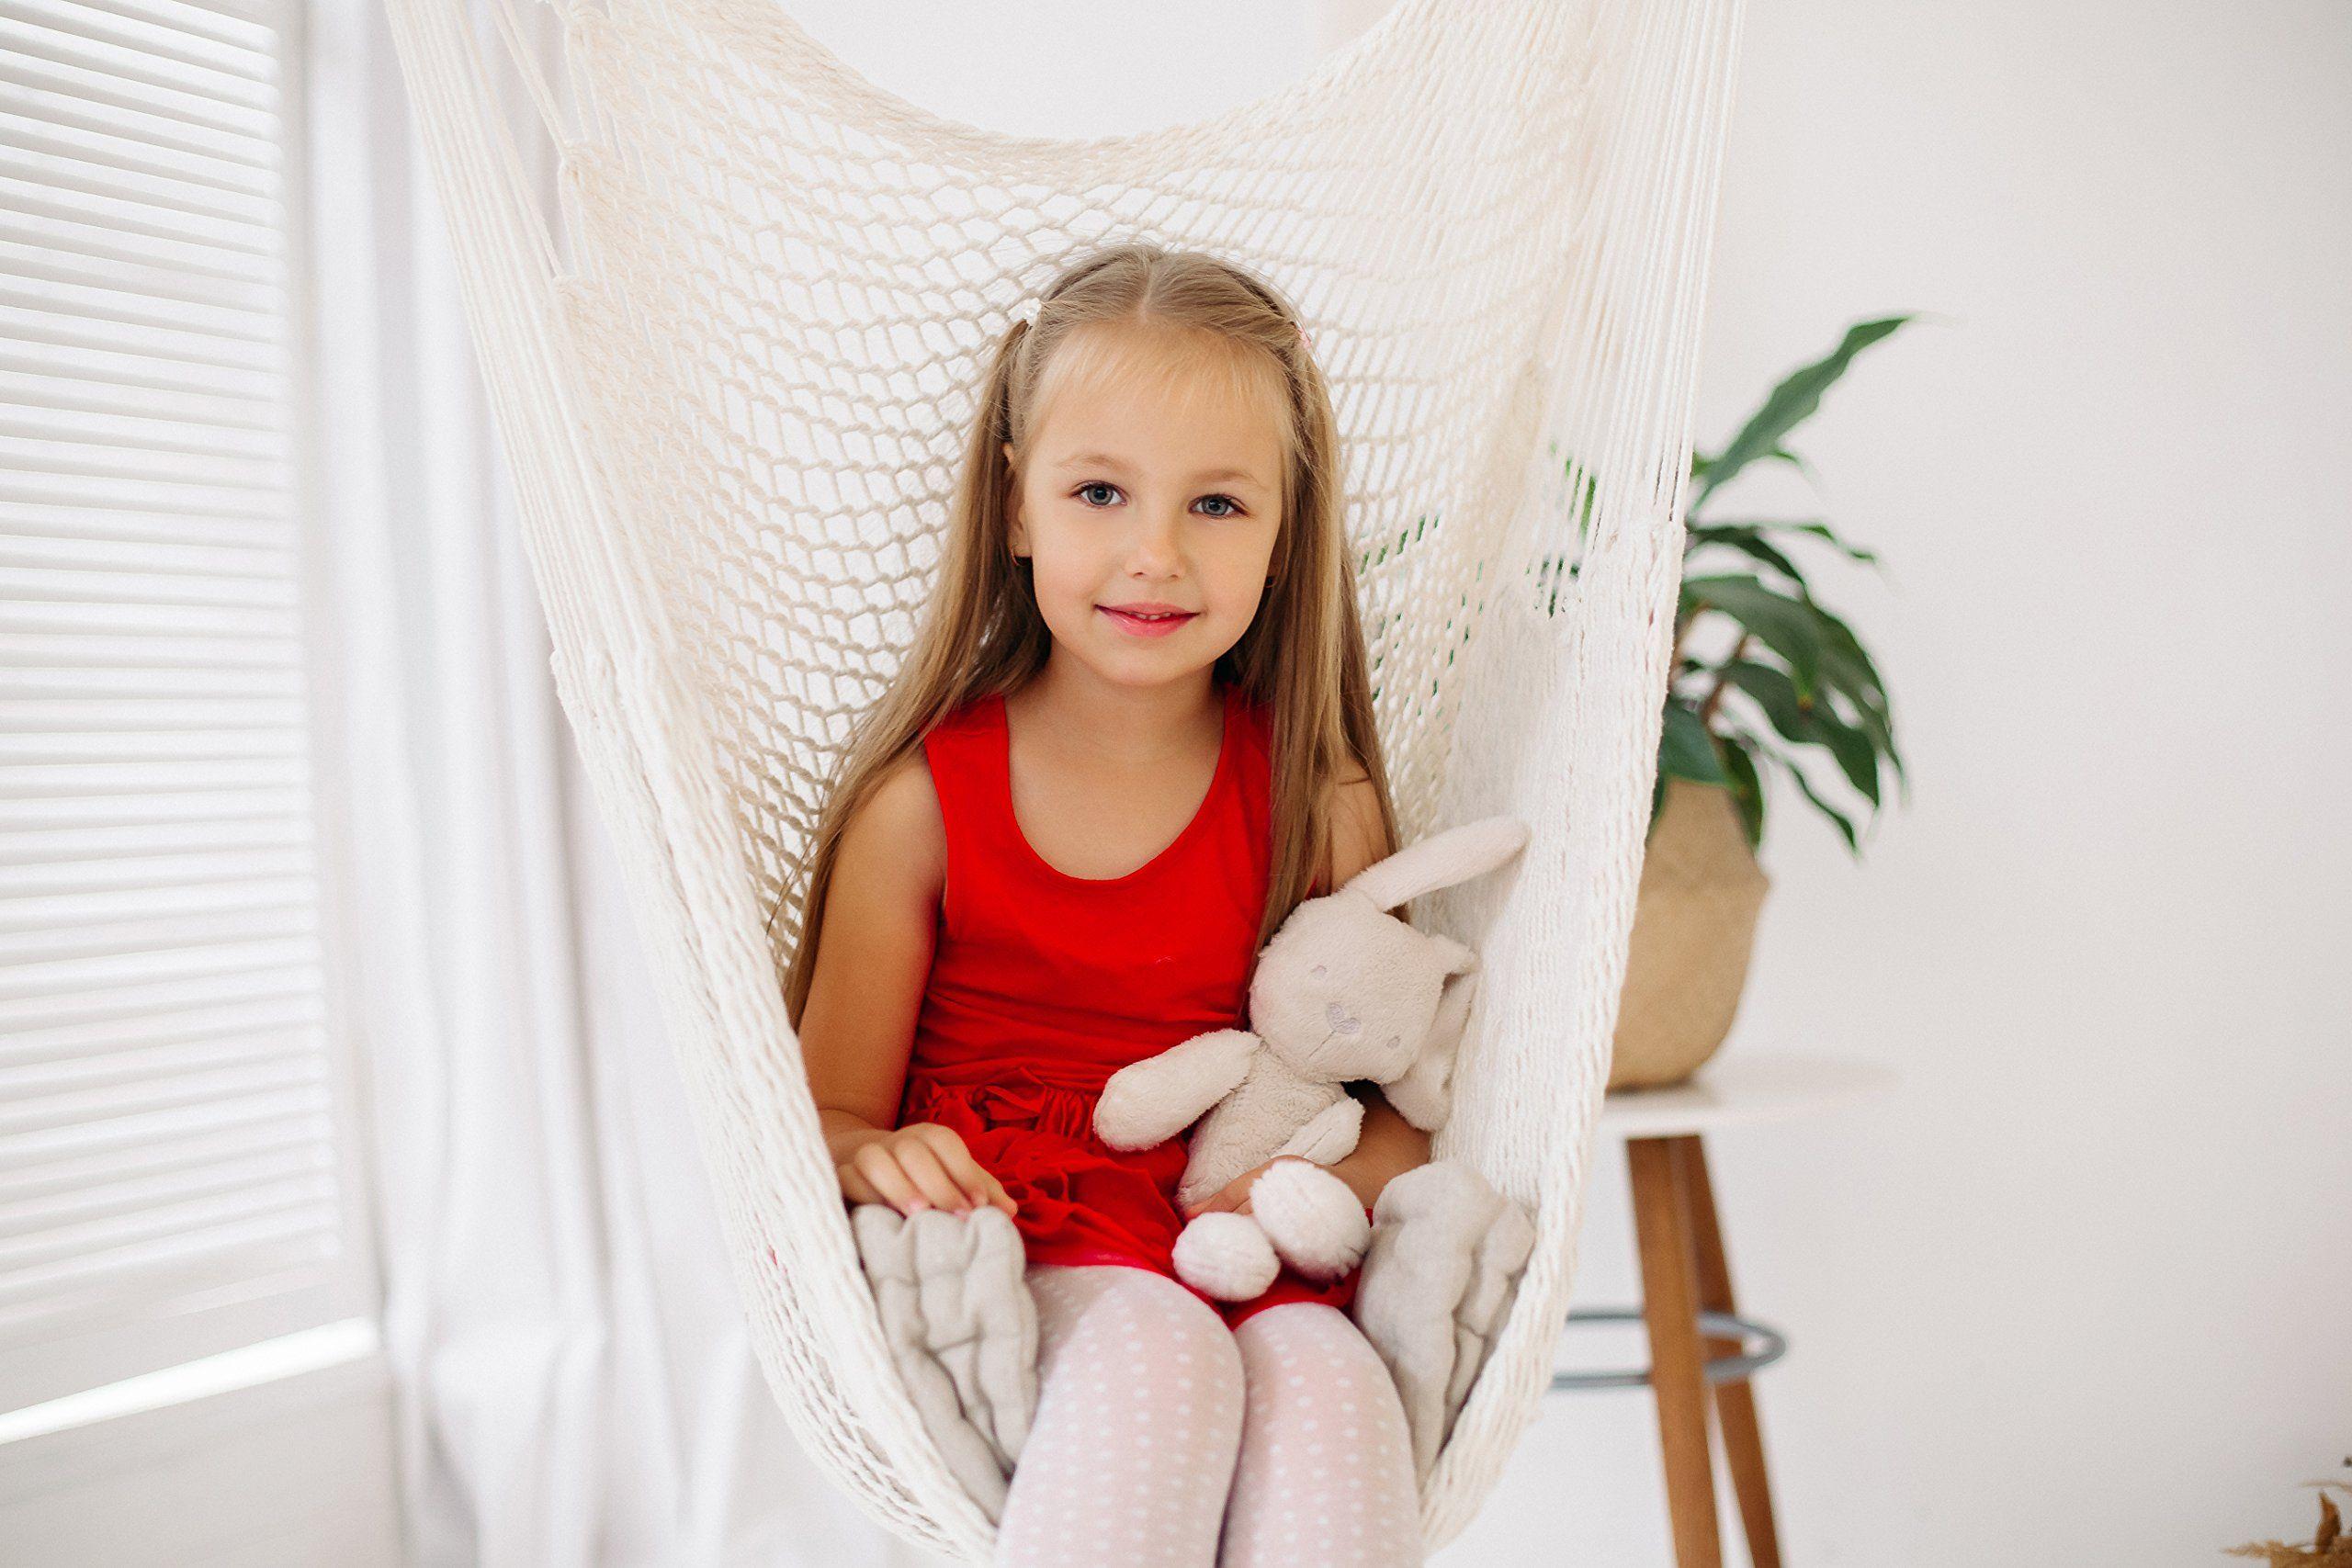 Teen girl bedrooms amerigo ultra strong hammock chair hanging kit